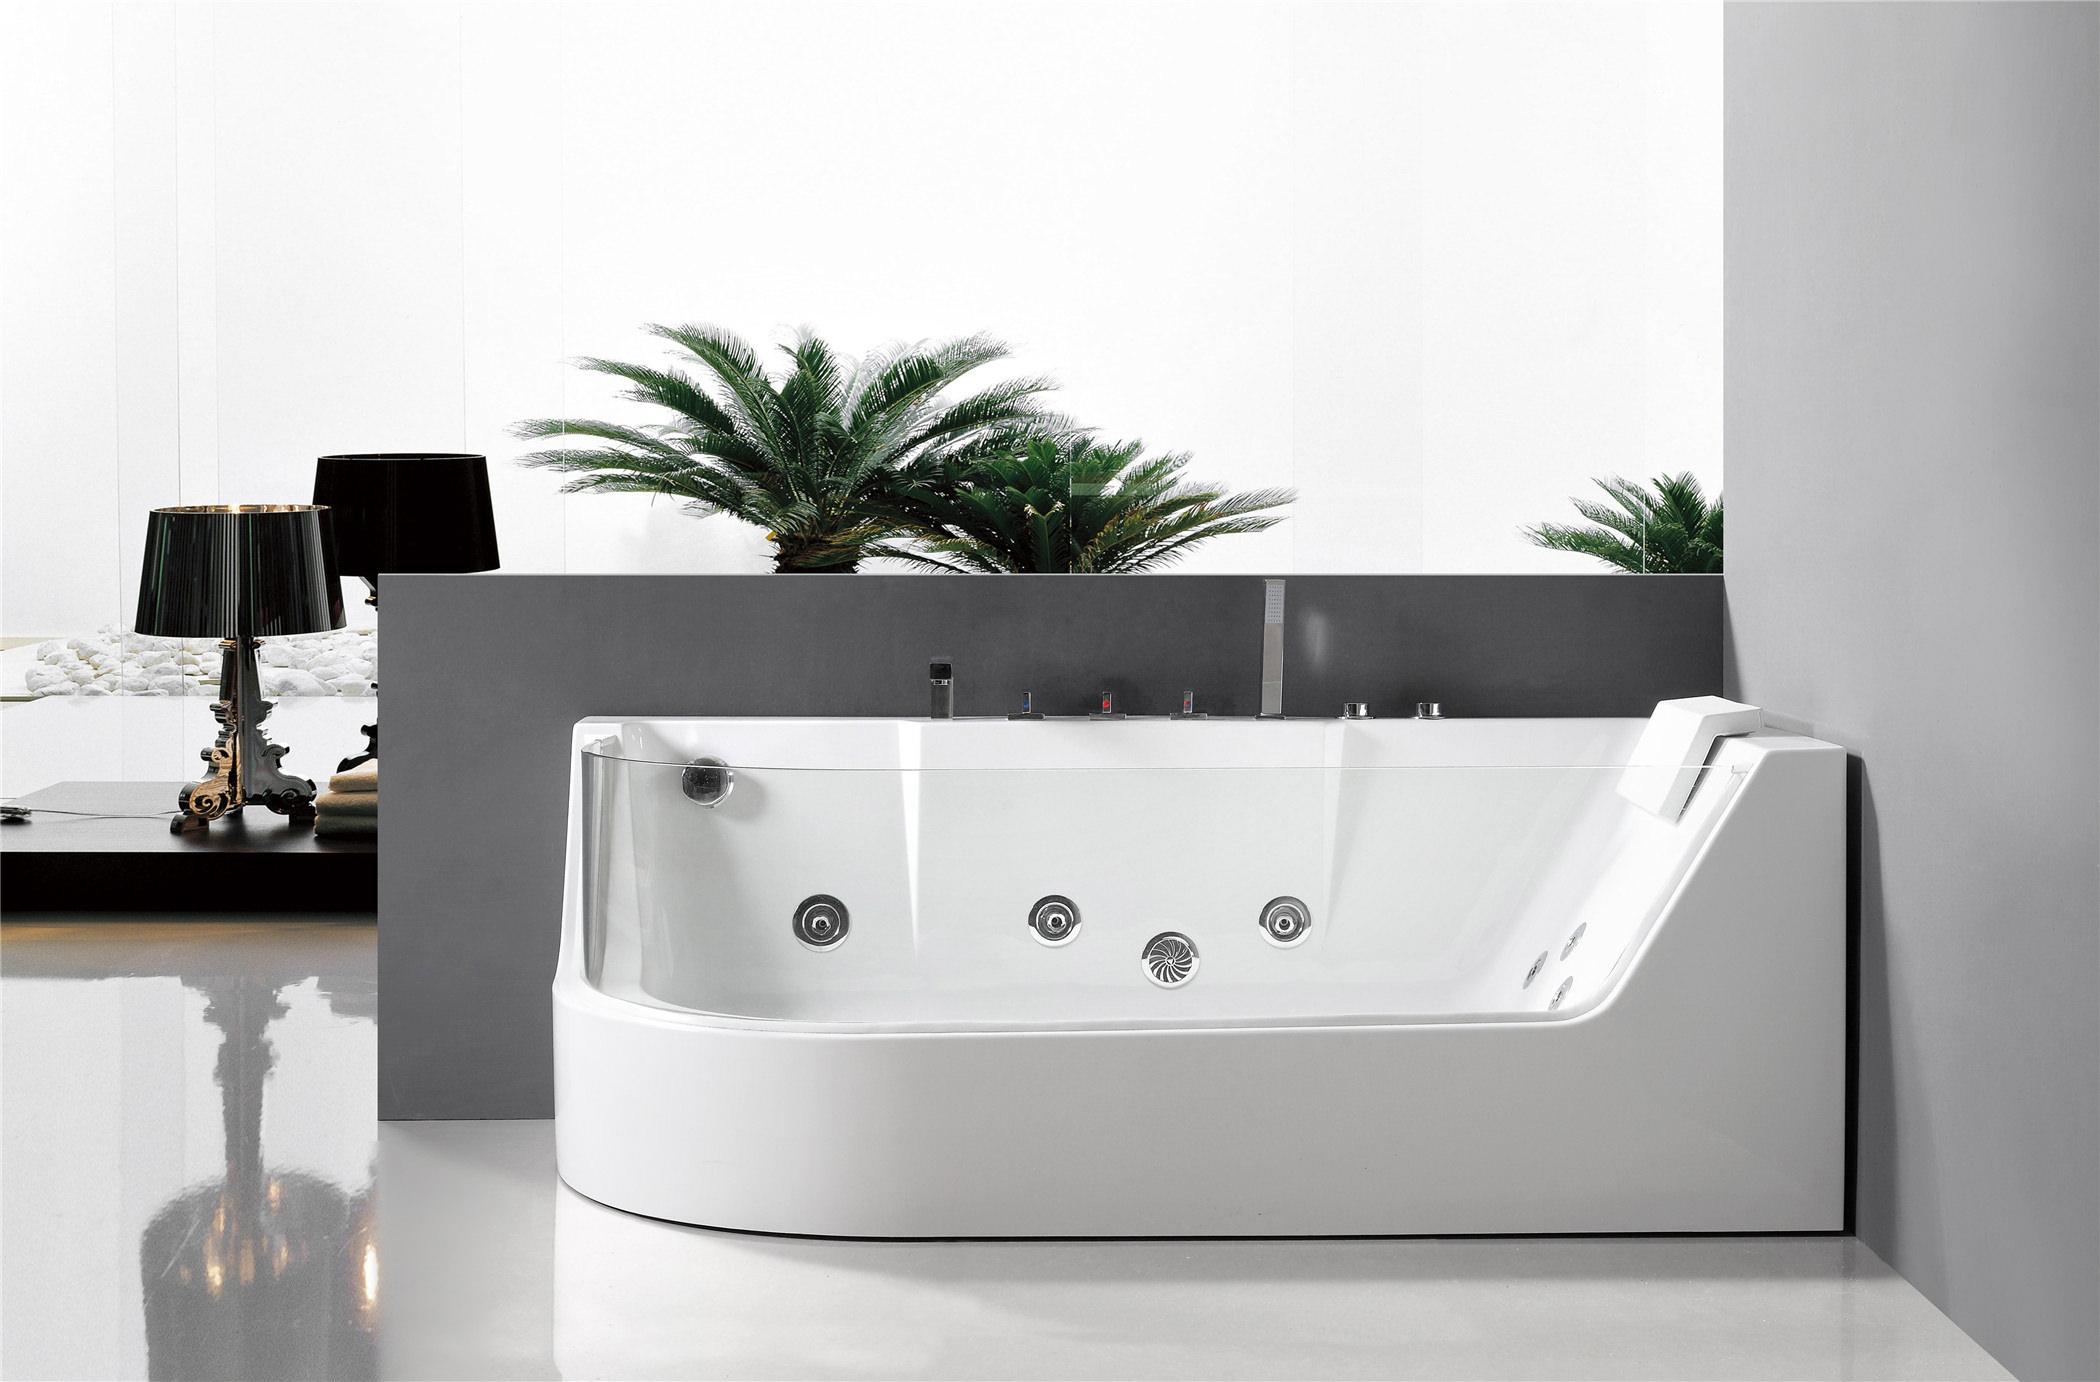 Whirlpool whirlwanne doccia jacuzzi piscina vasca da bagno - Vasca da bagno piscina ...